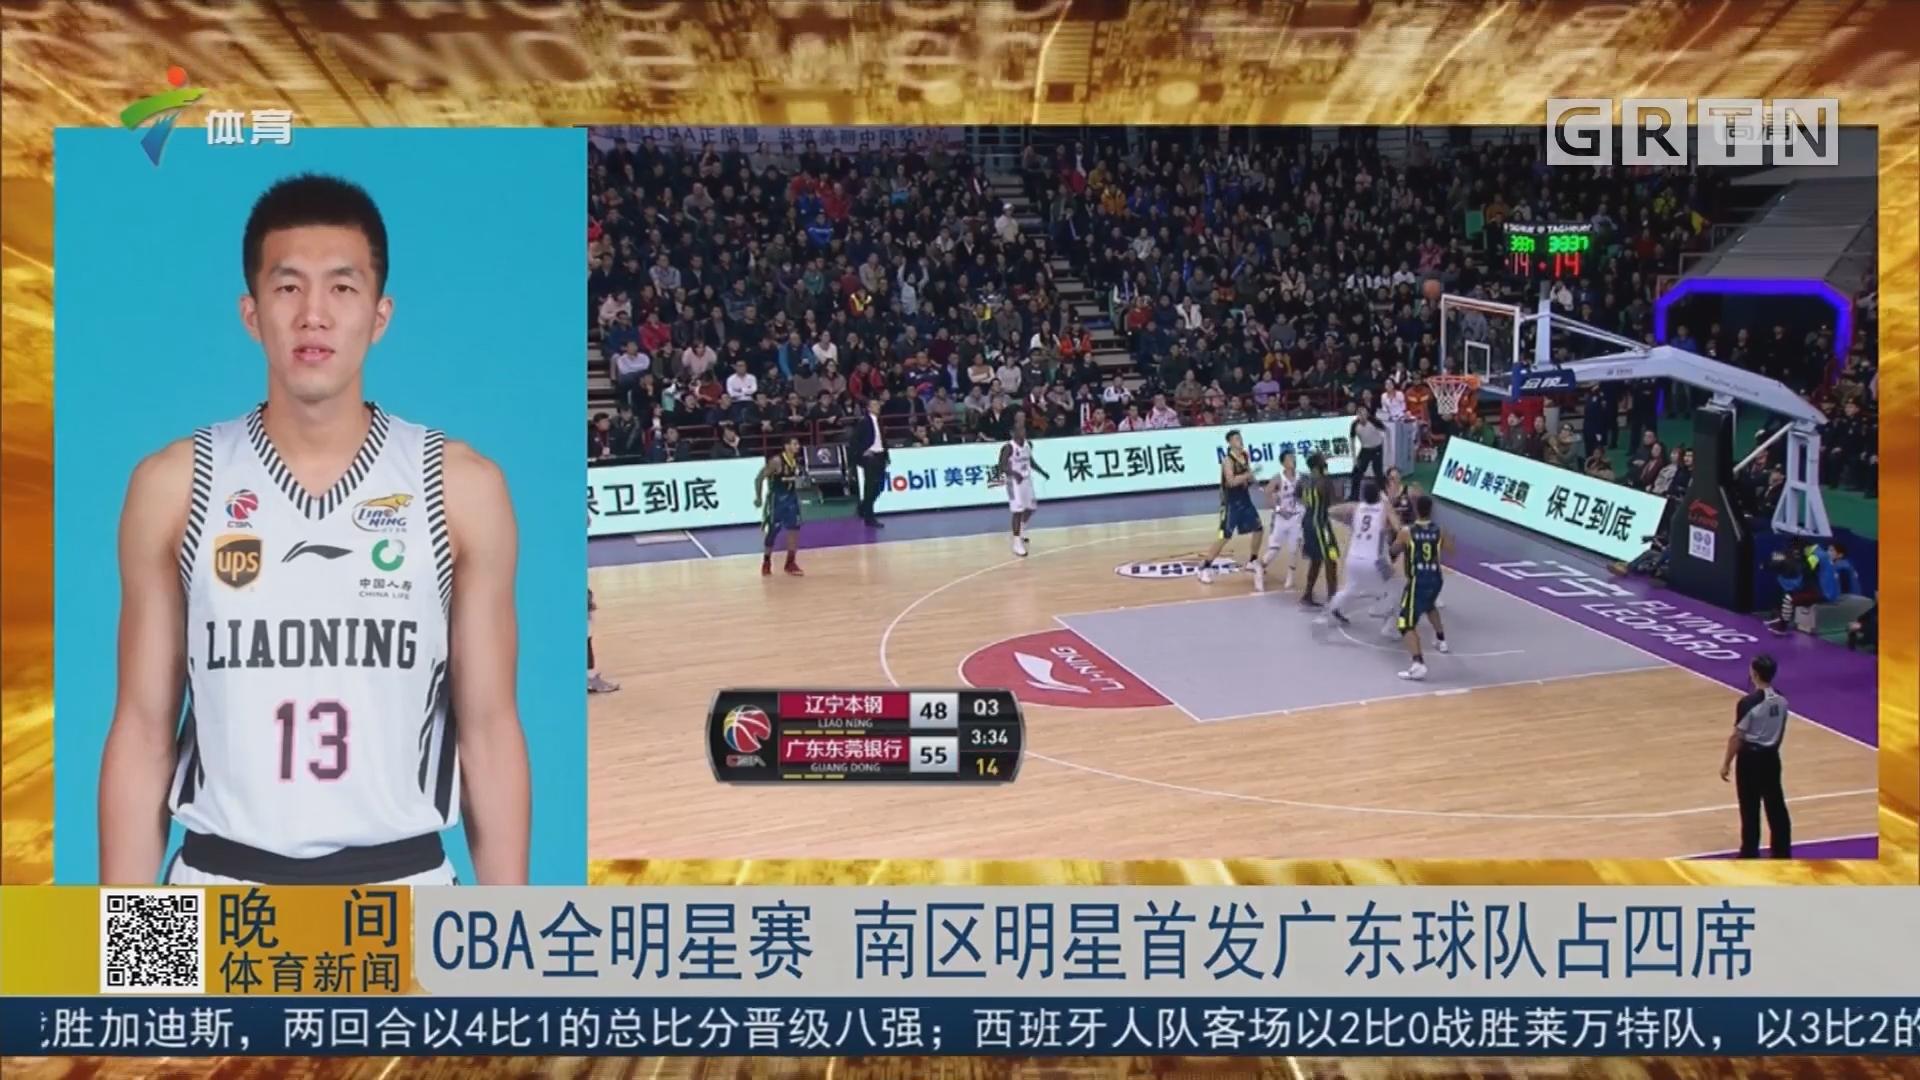 CBA全明星赛 南区明星首发广东球队占四席